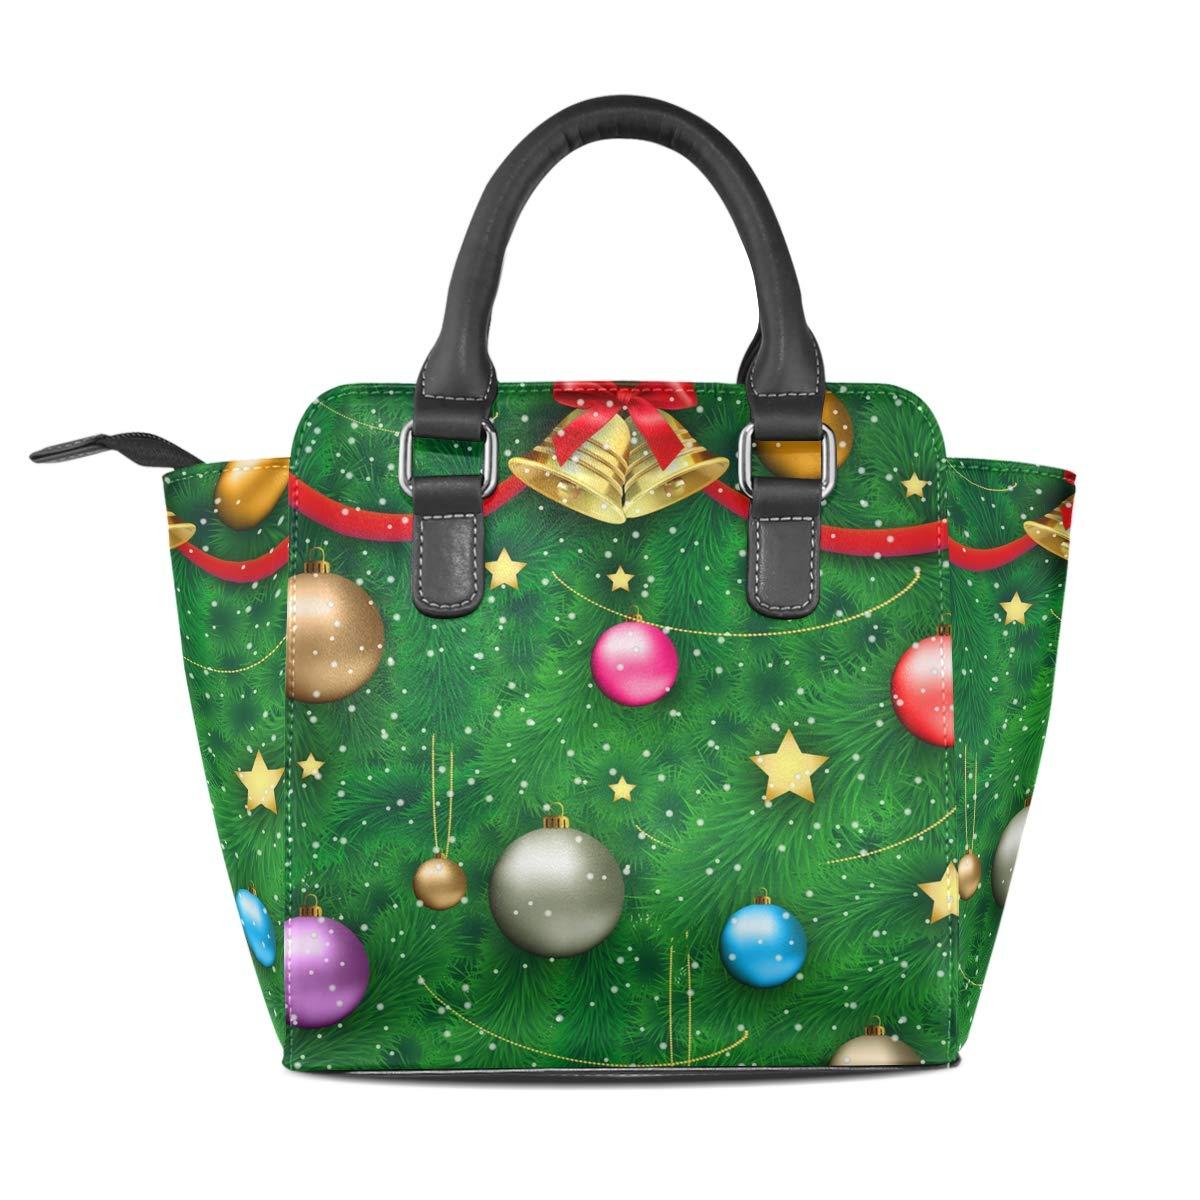 Outdoor Christmas Decor Ornament Womens Classy Satchel Handbag Handbag With shoulder Strap Crossbody Bag